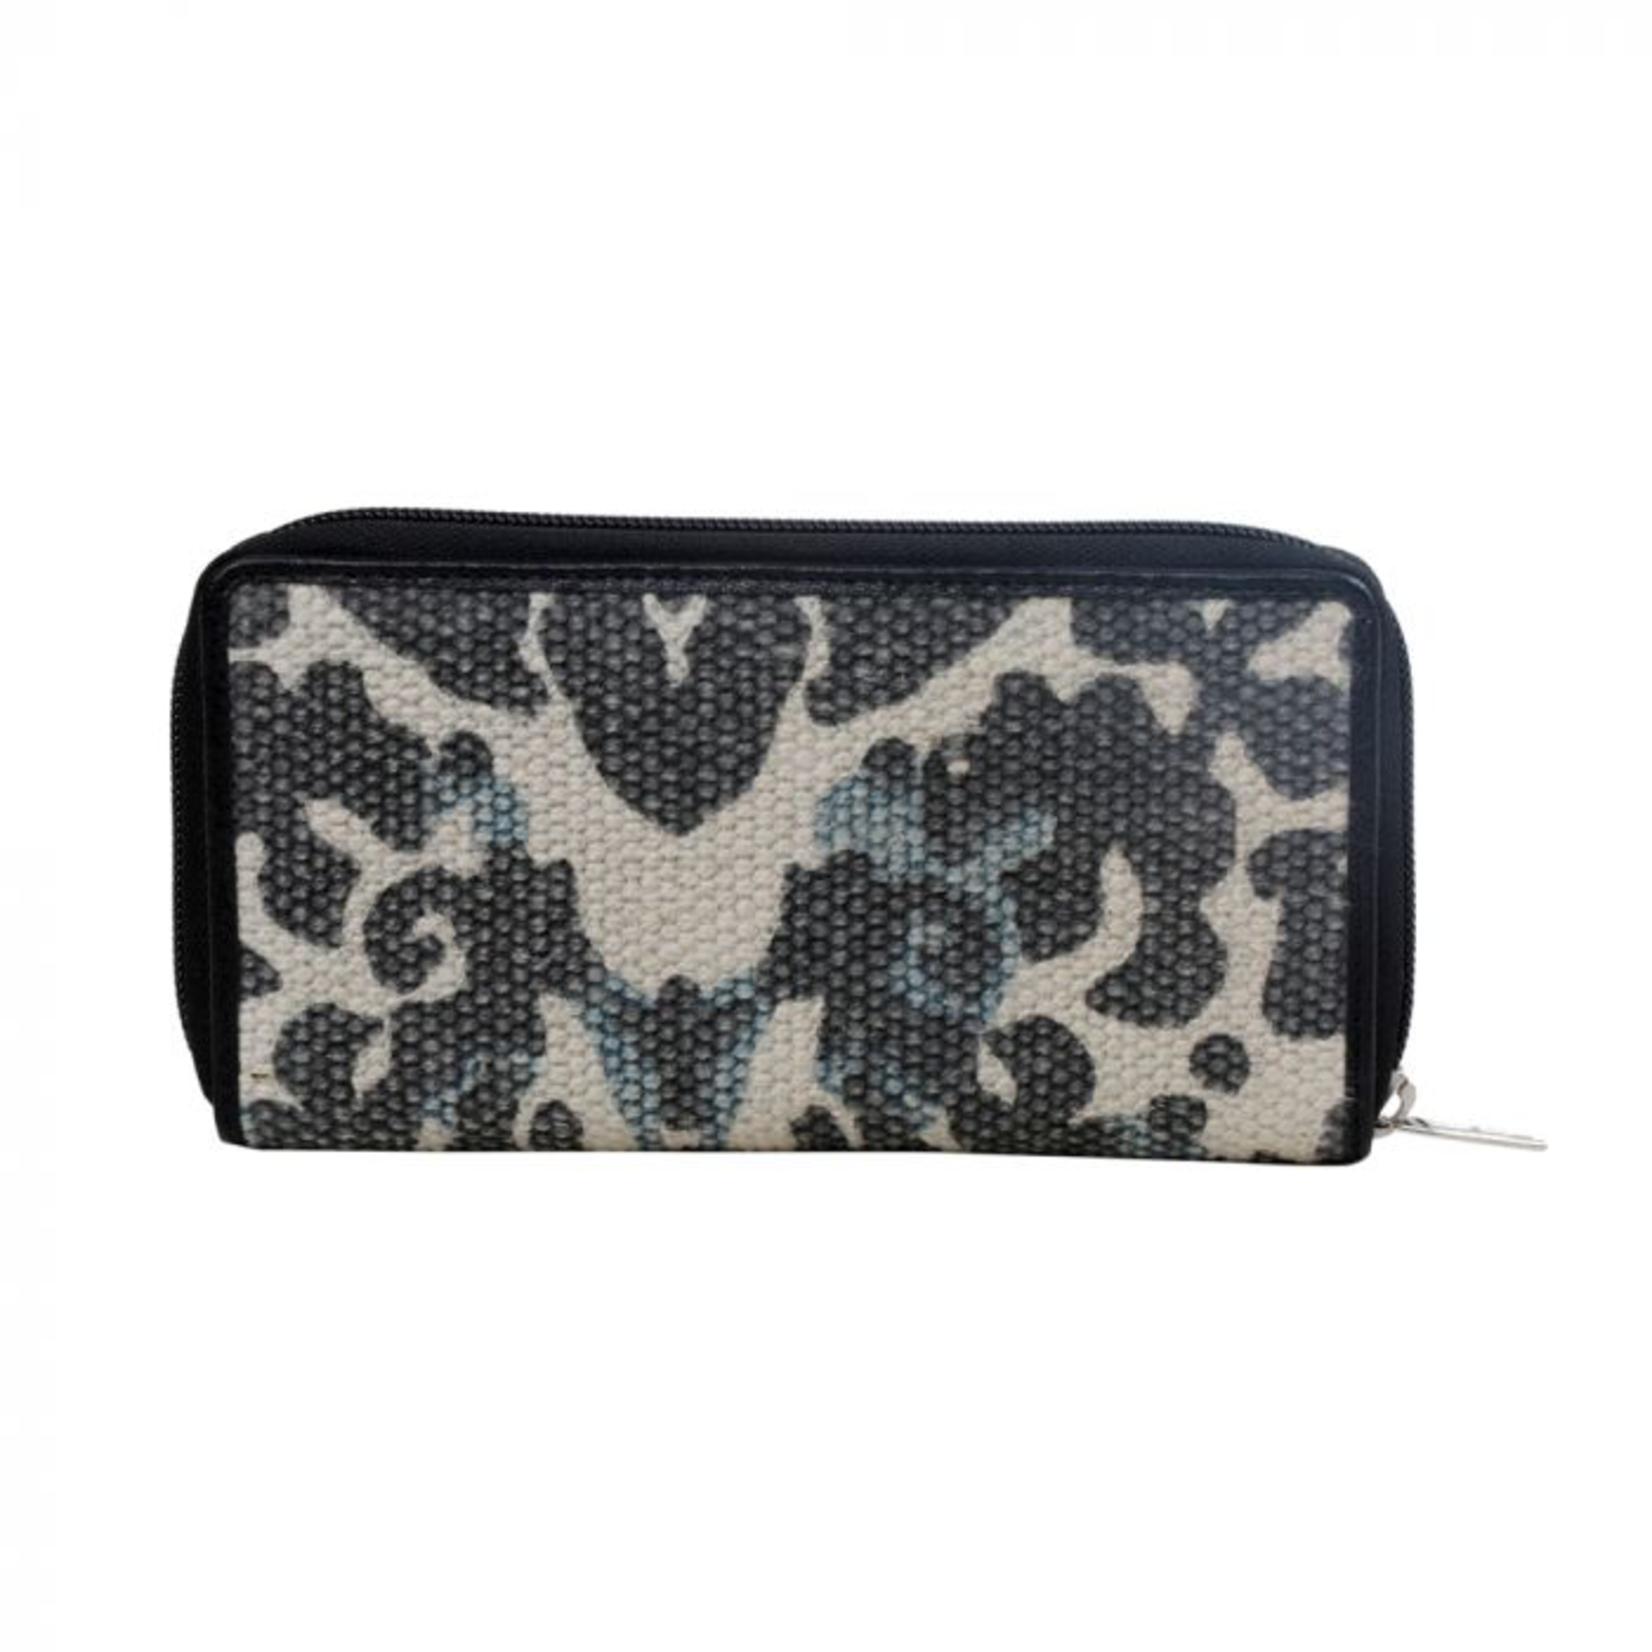 Myra Bag Wallet: Blue Foliaged